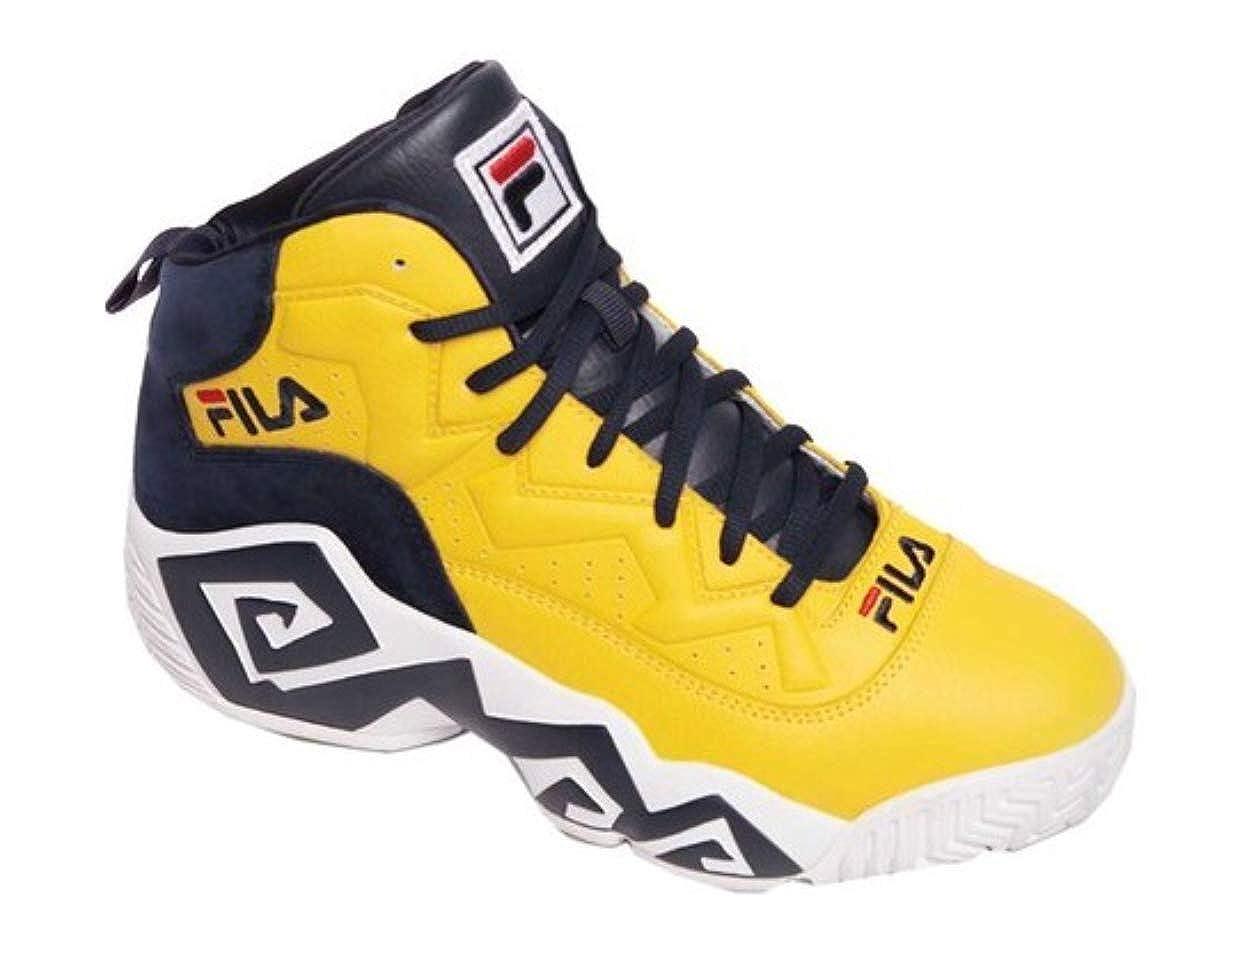 Fila MB Heritage Sneaker,Yellow 13